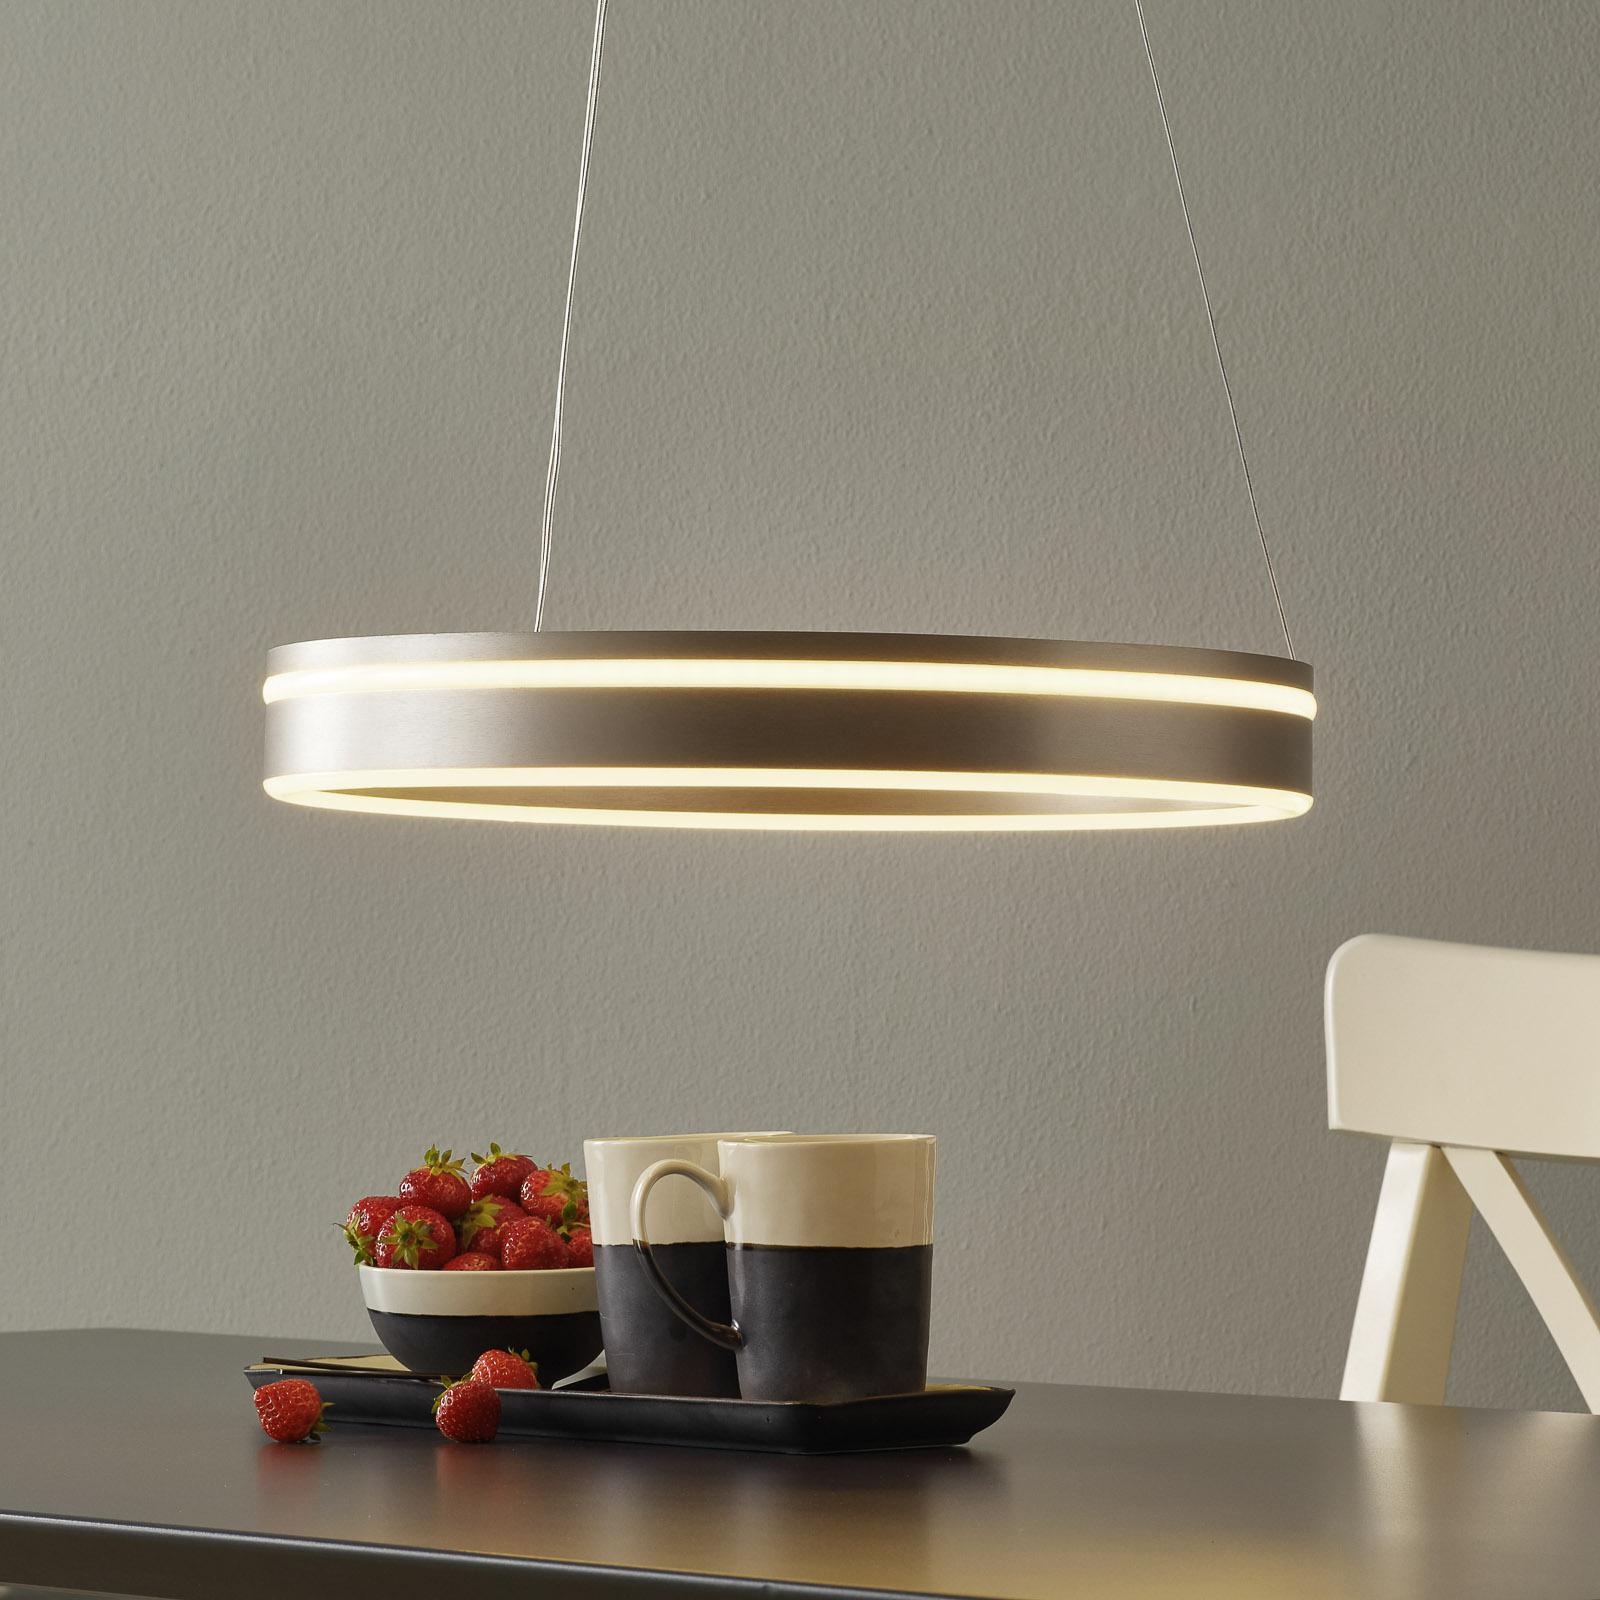 Paul Neuhaus Q-VITO LED-riippuvalaisin 40 cm teräs